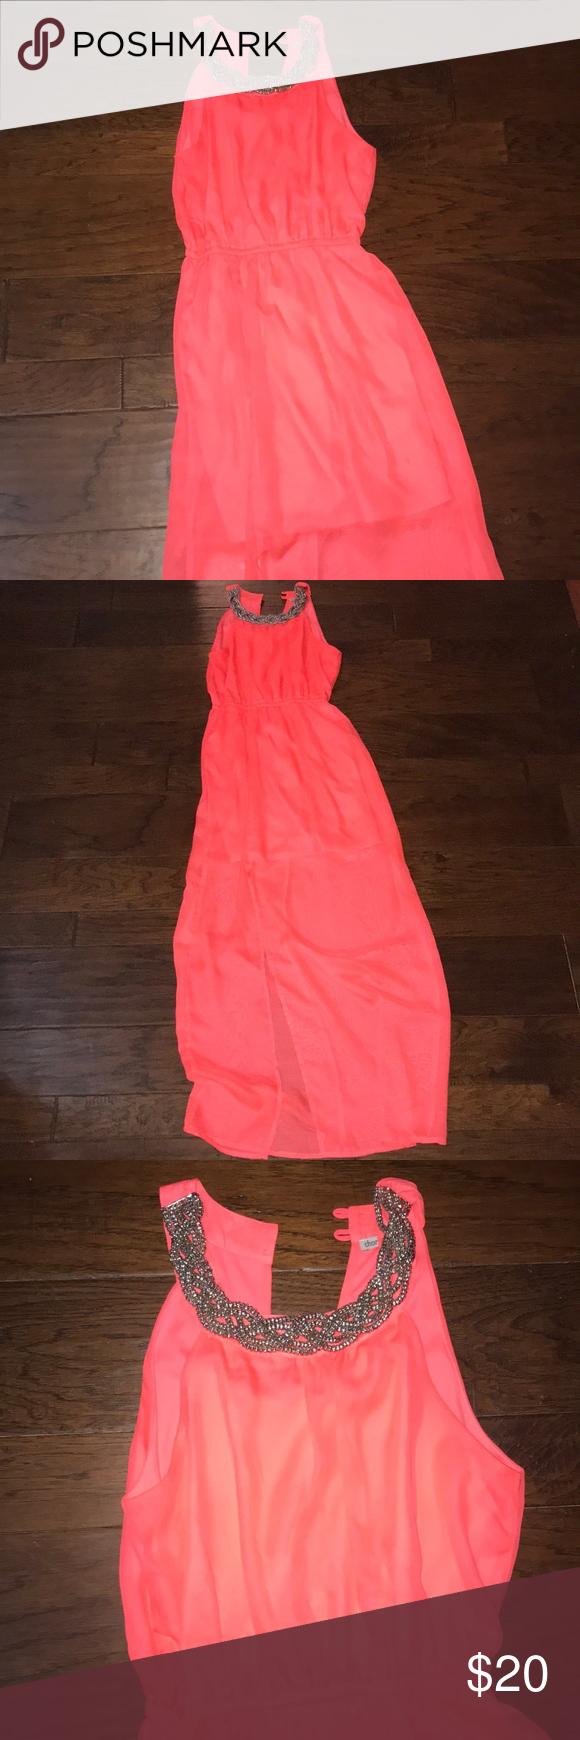 Hot pink maxi dress  Hot pink maxi dress Size small